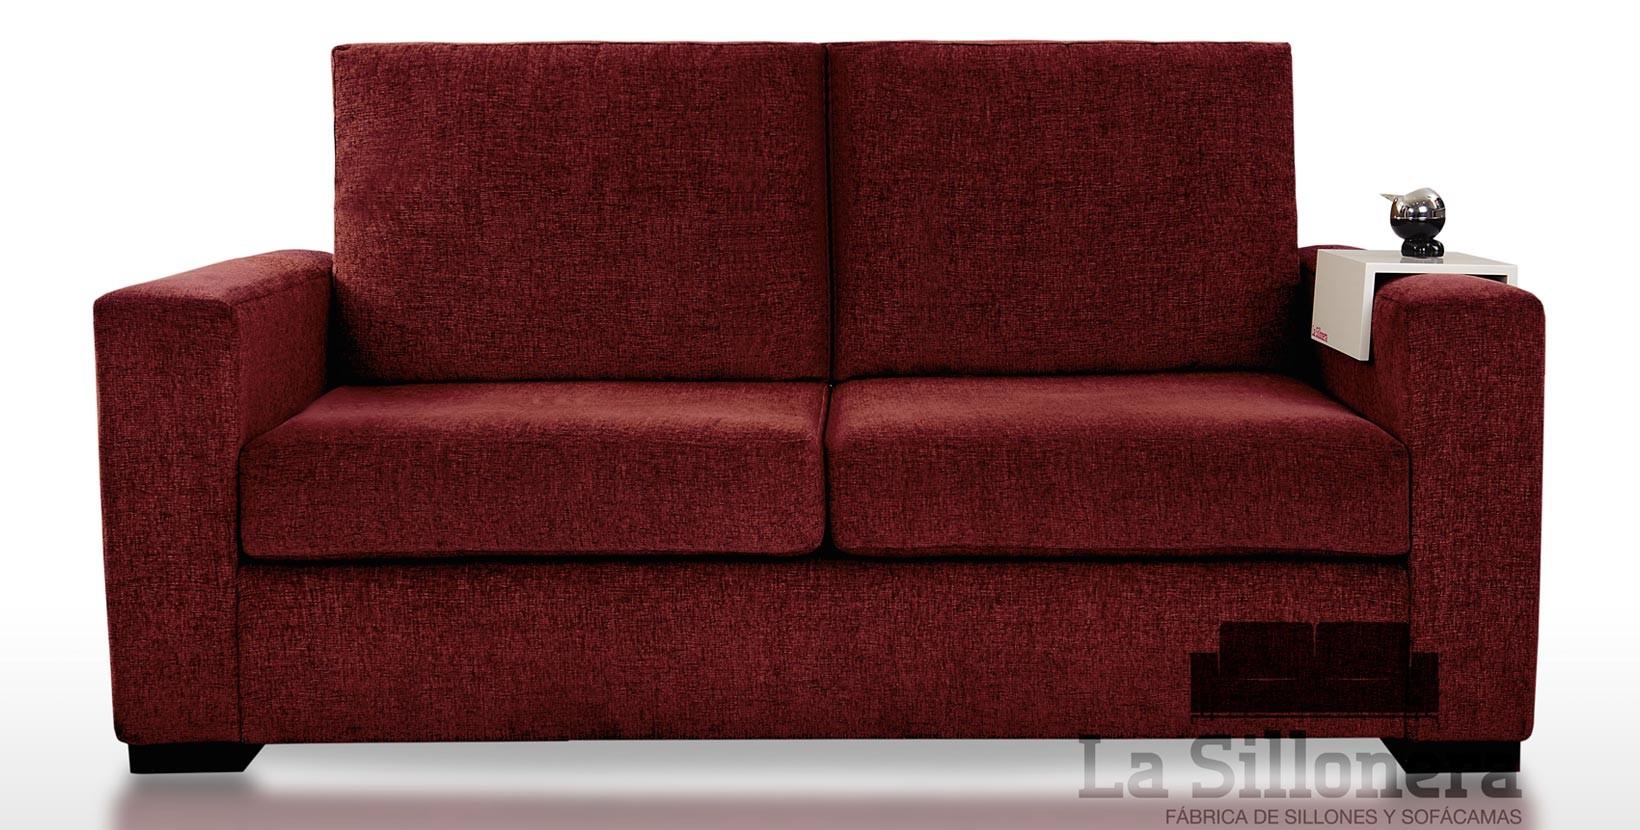 Sillon modelo luca 2 y 3 cuerpos - Sofa cama clasico ...